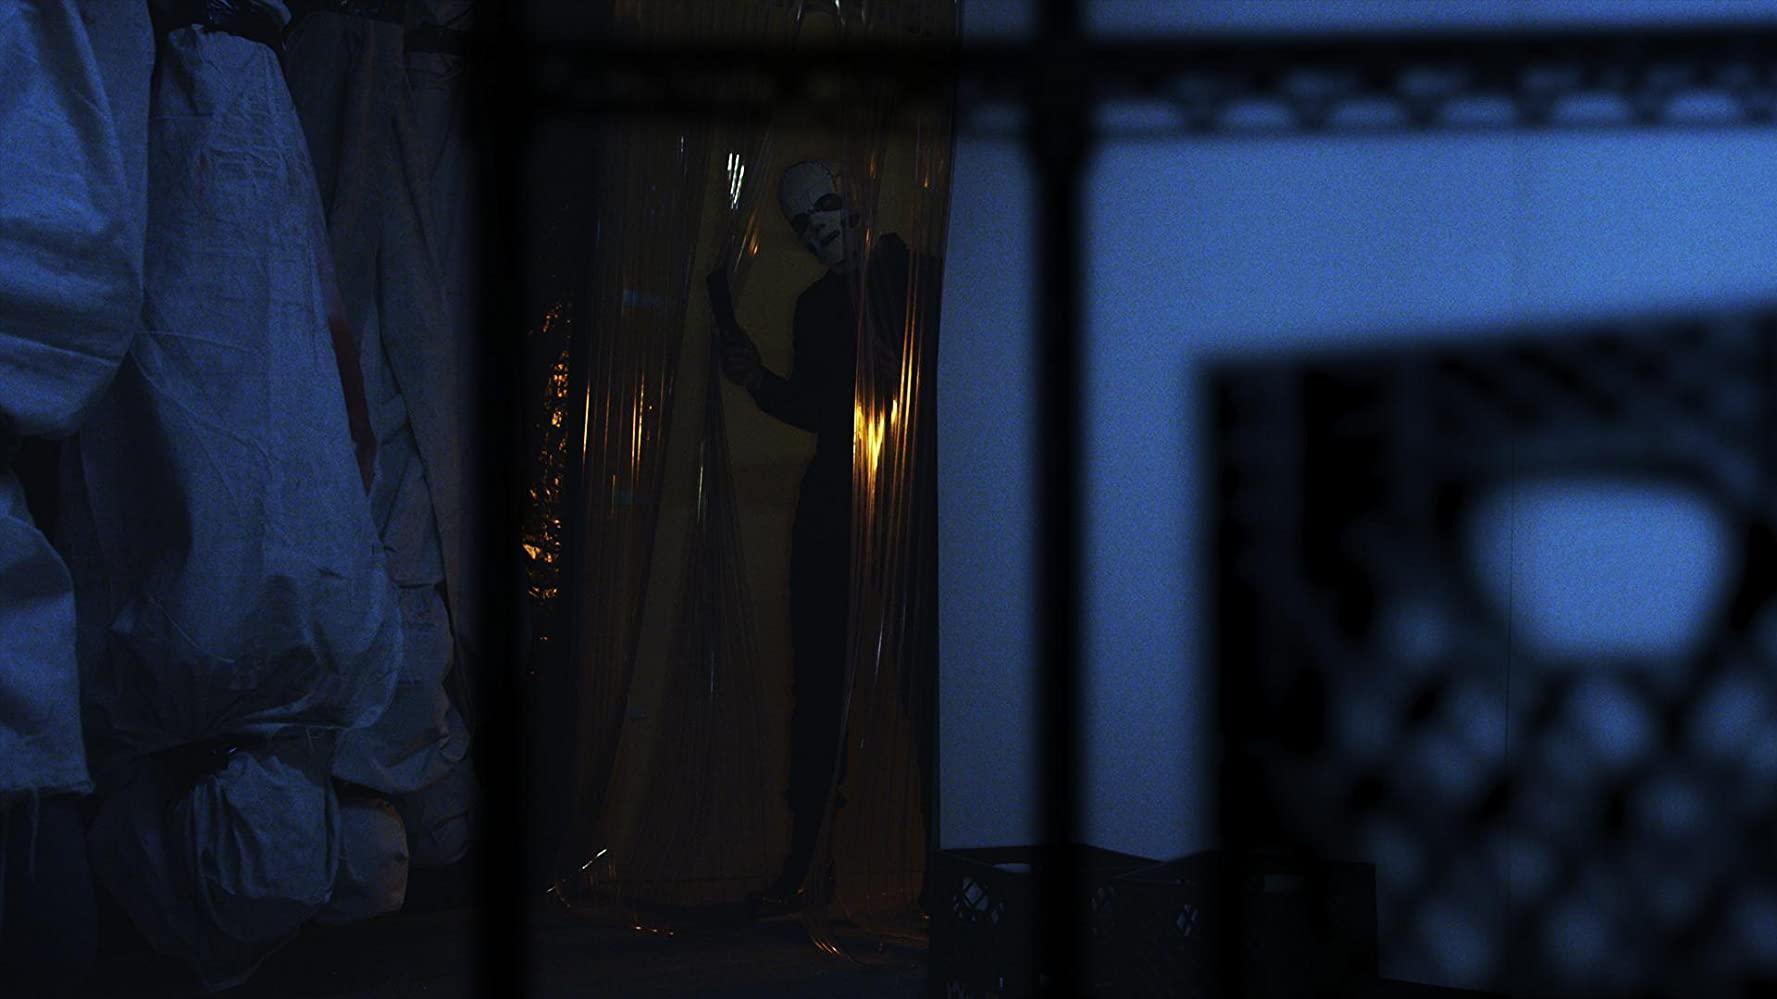 مشاهدة فيلم Witnesses (2019) مترجم HD اون لاين